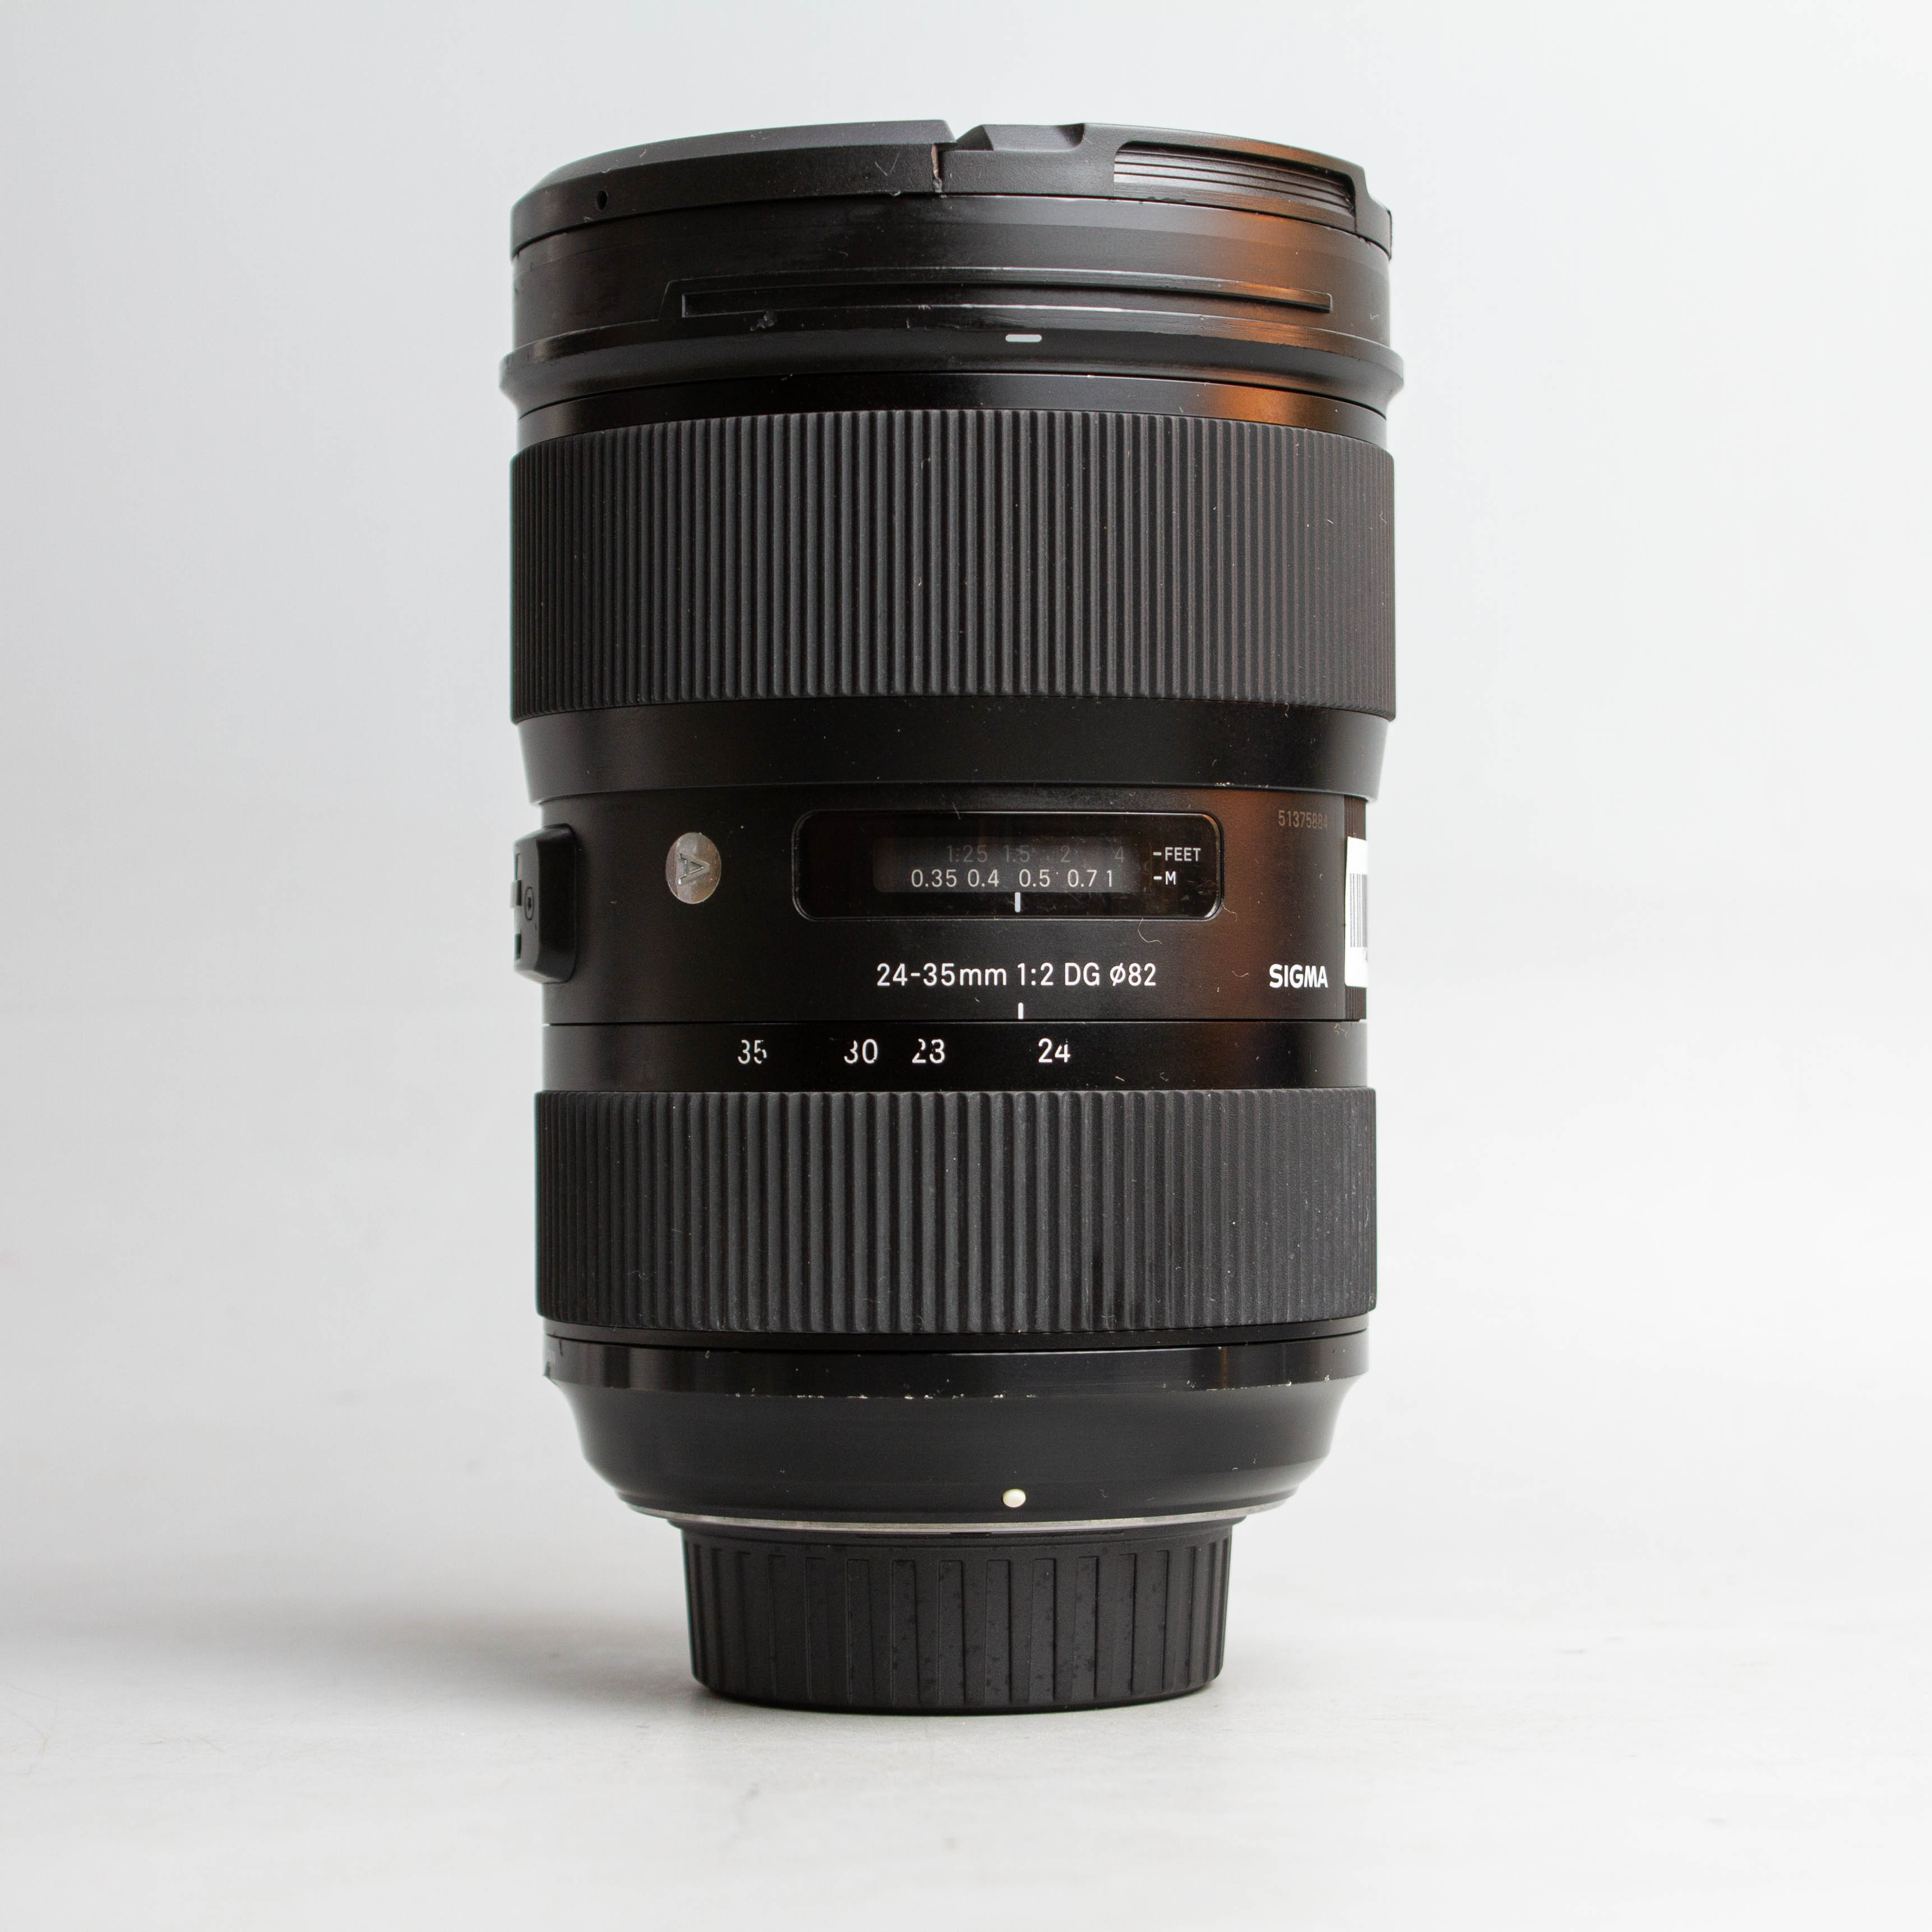 sigma-24-35mm-f2-art-af-nikon-24-35-2-0-17440